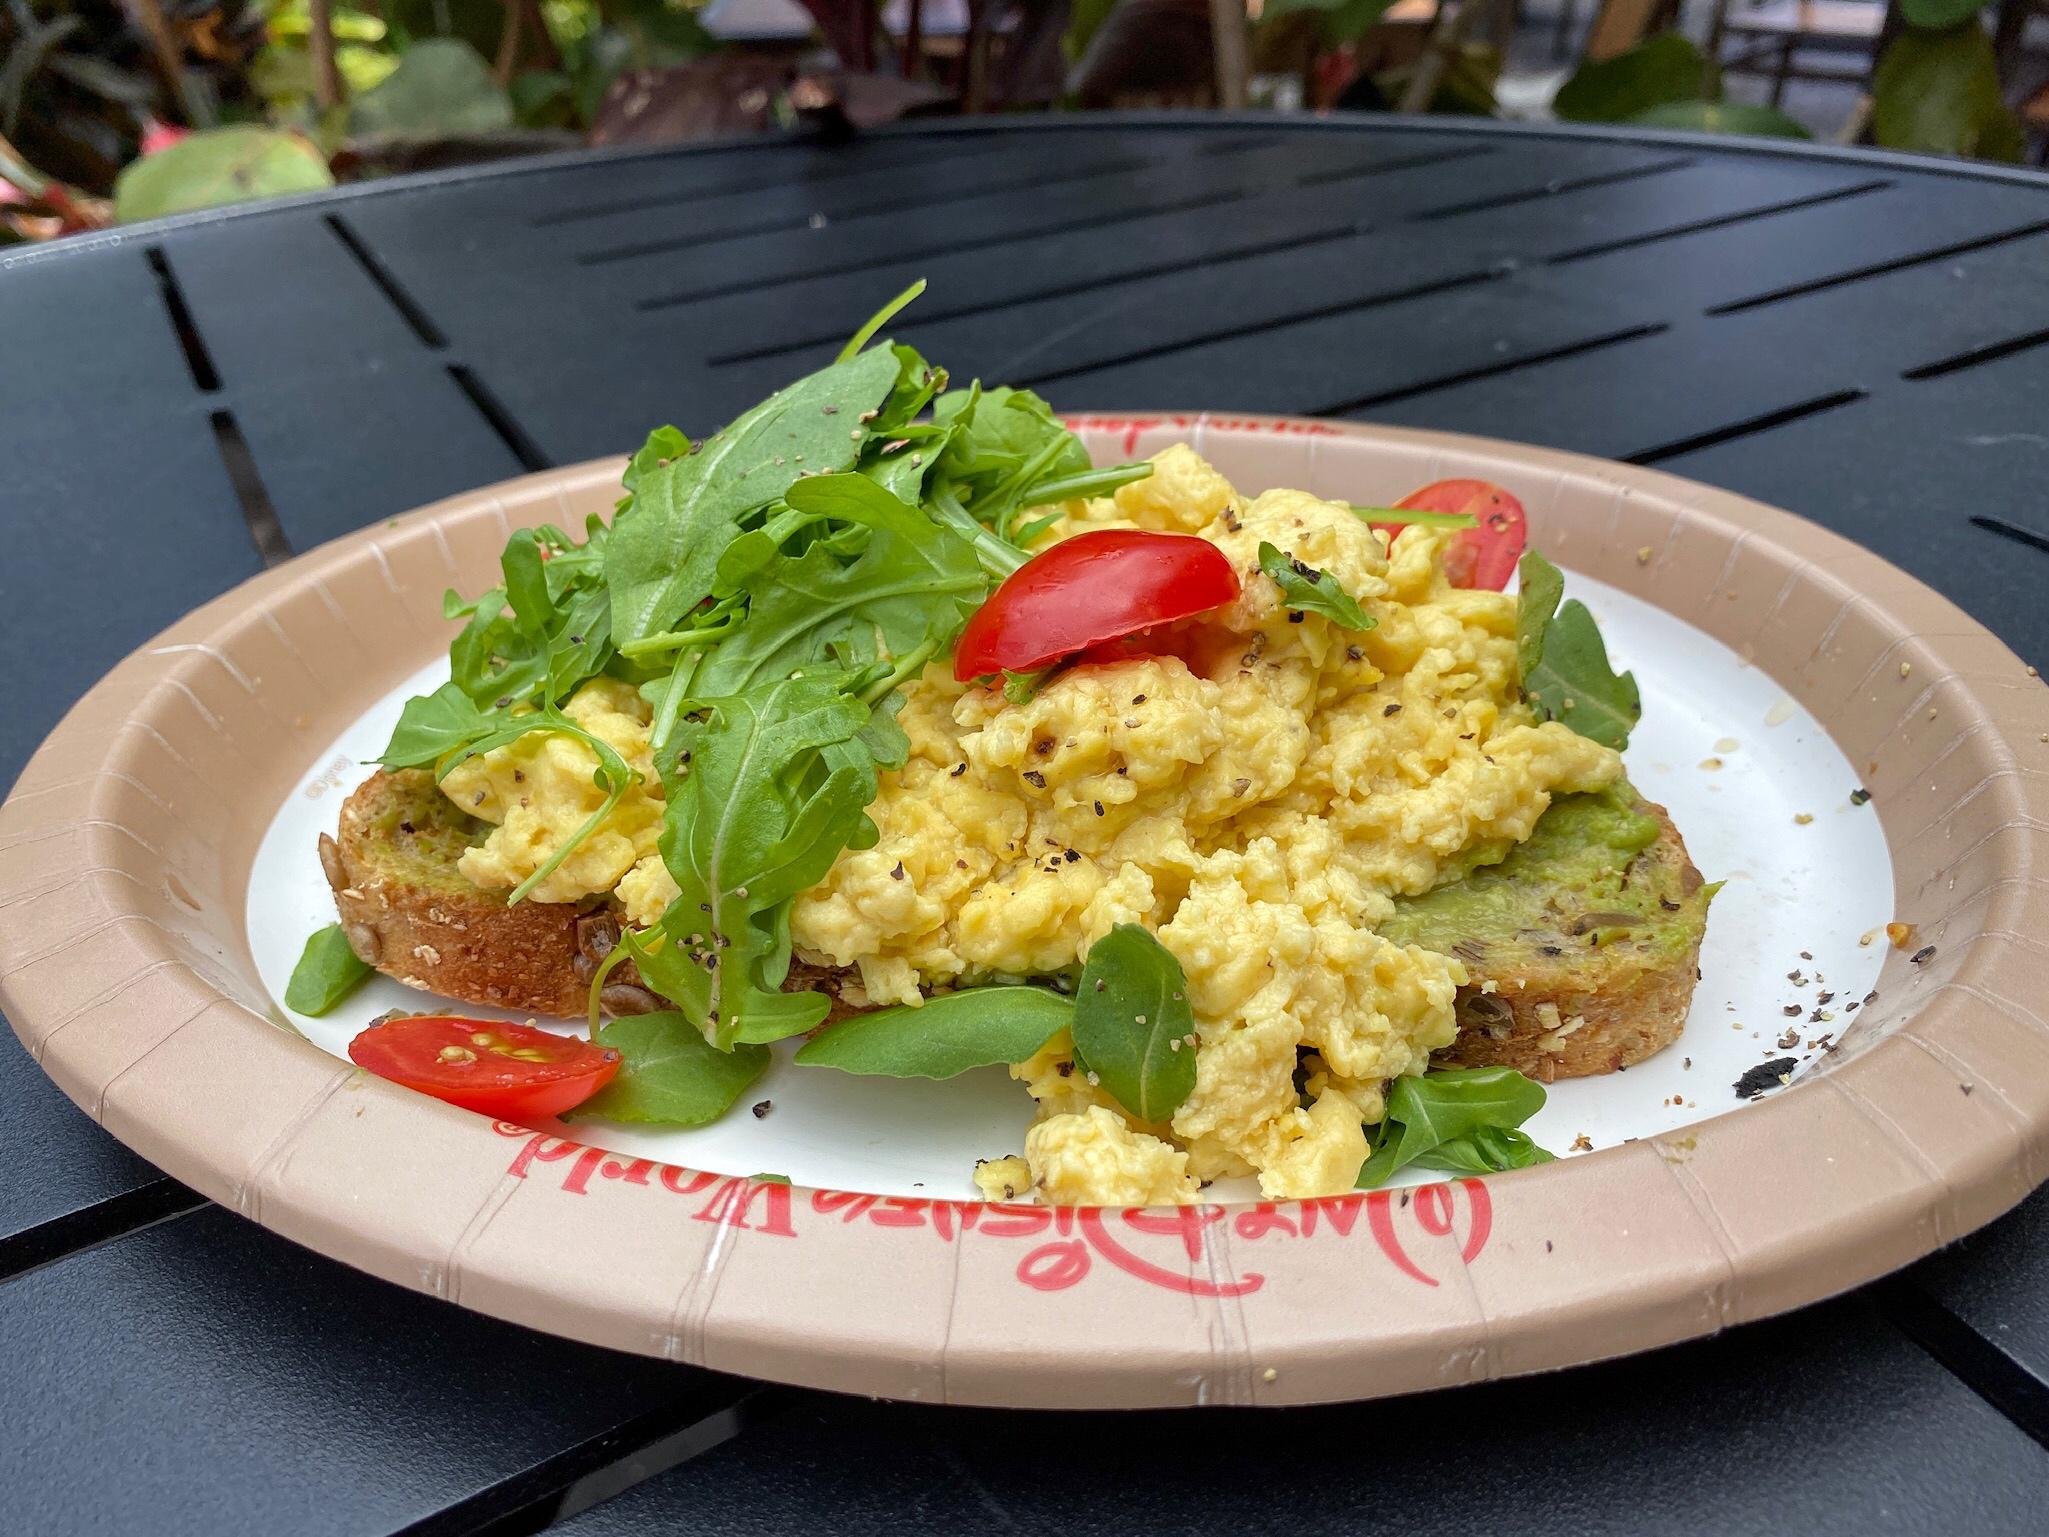 Vegan Avocado Toast at Captain Cook's in Disney's Polynesian Resort at Walt Disney World